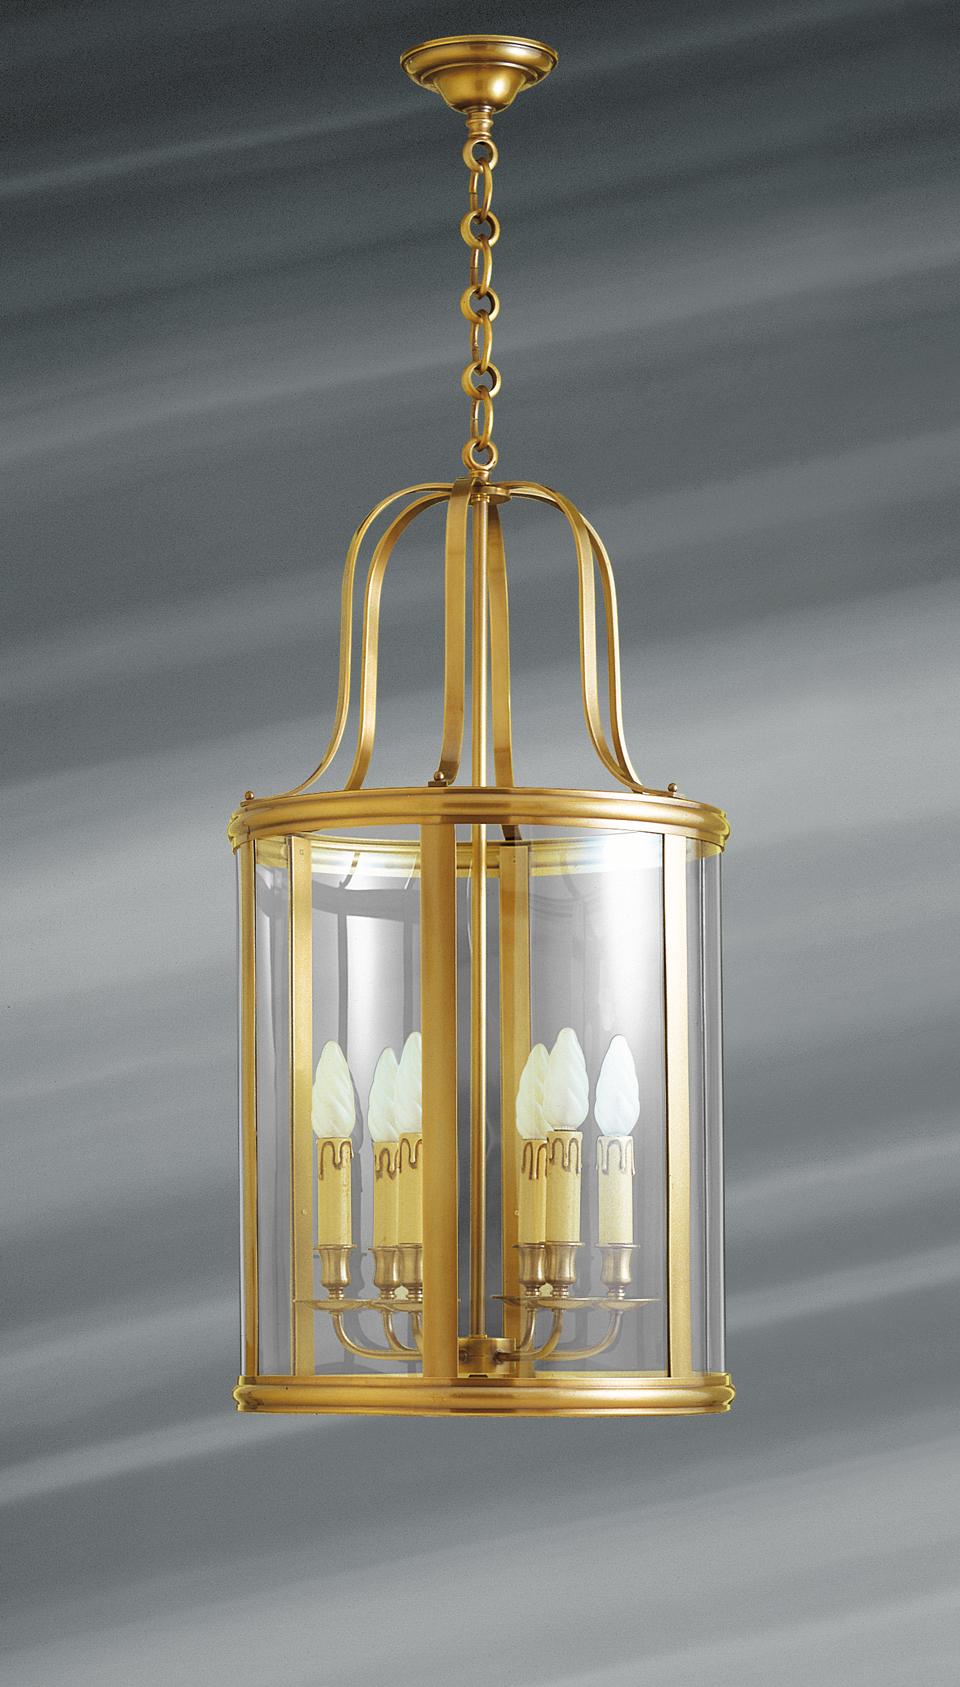 grande lanterne de style classique en bronze massif et. Black Bedroom Furniture Sets. Home Design Ideas